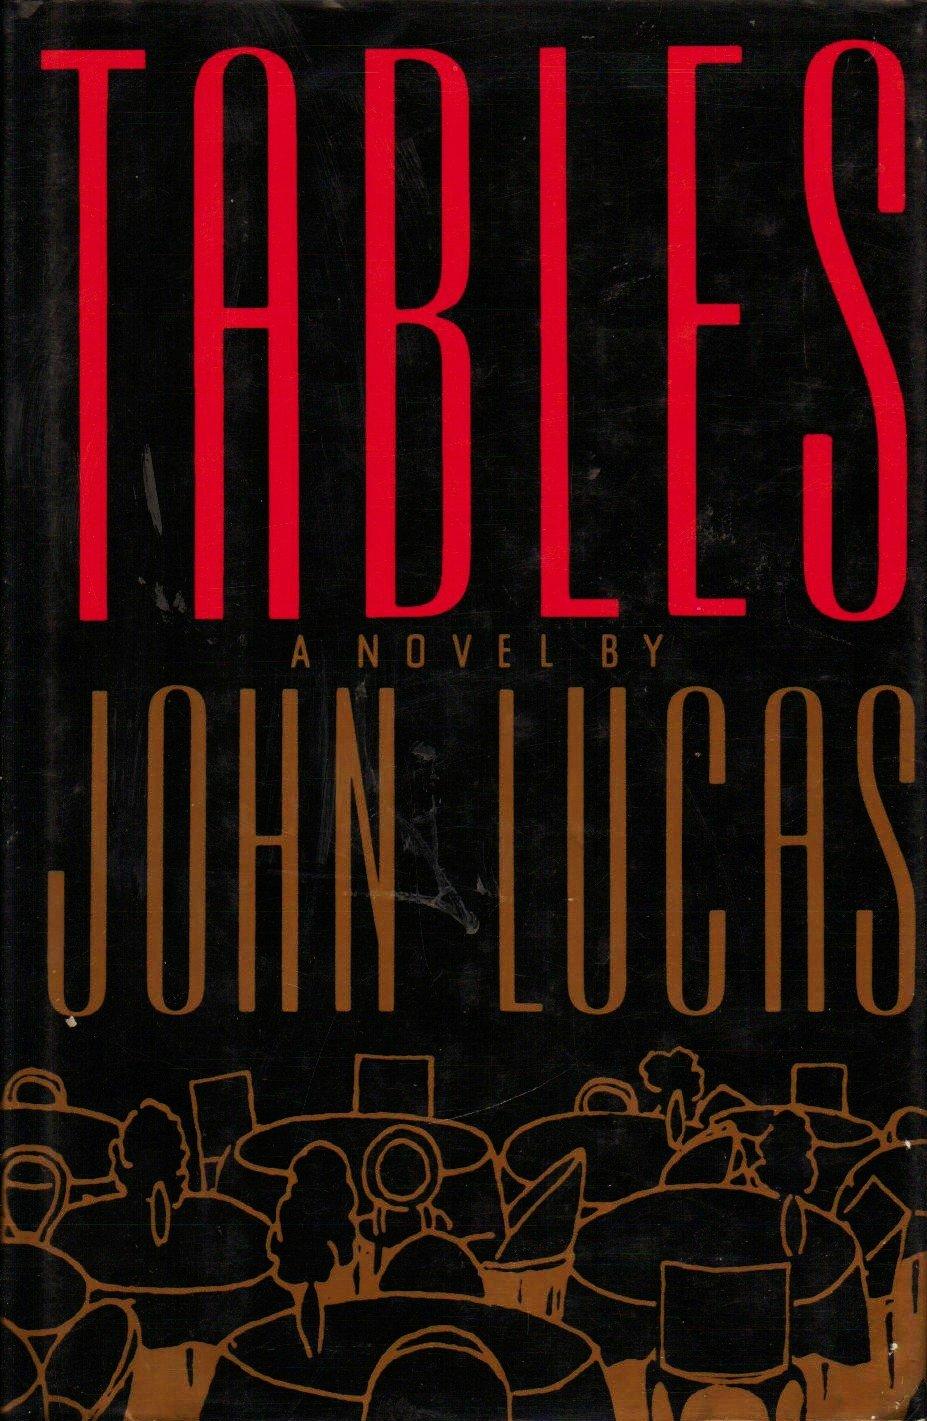 Tables - John Lucas - Hardcopy 0316535192